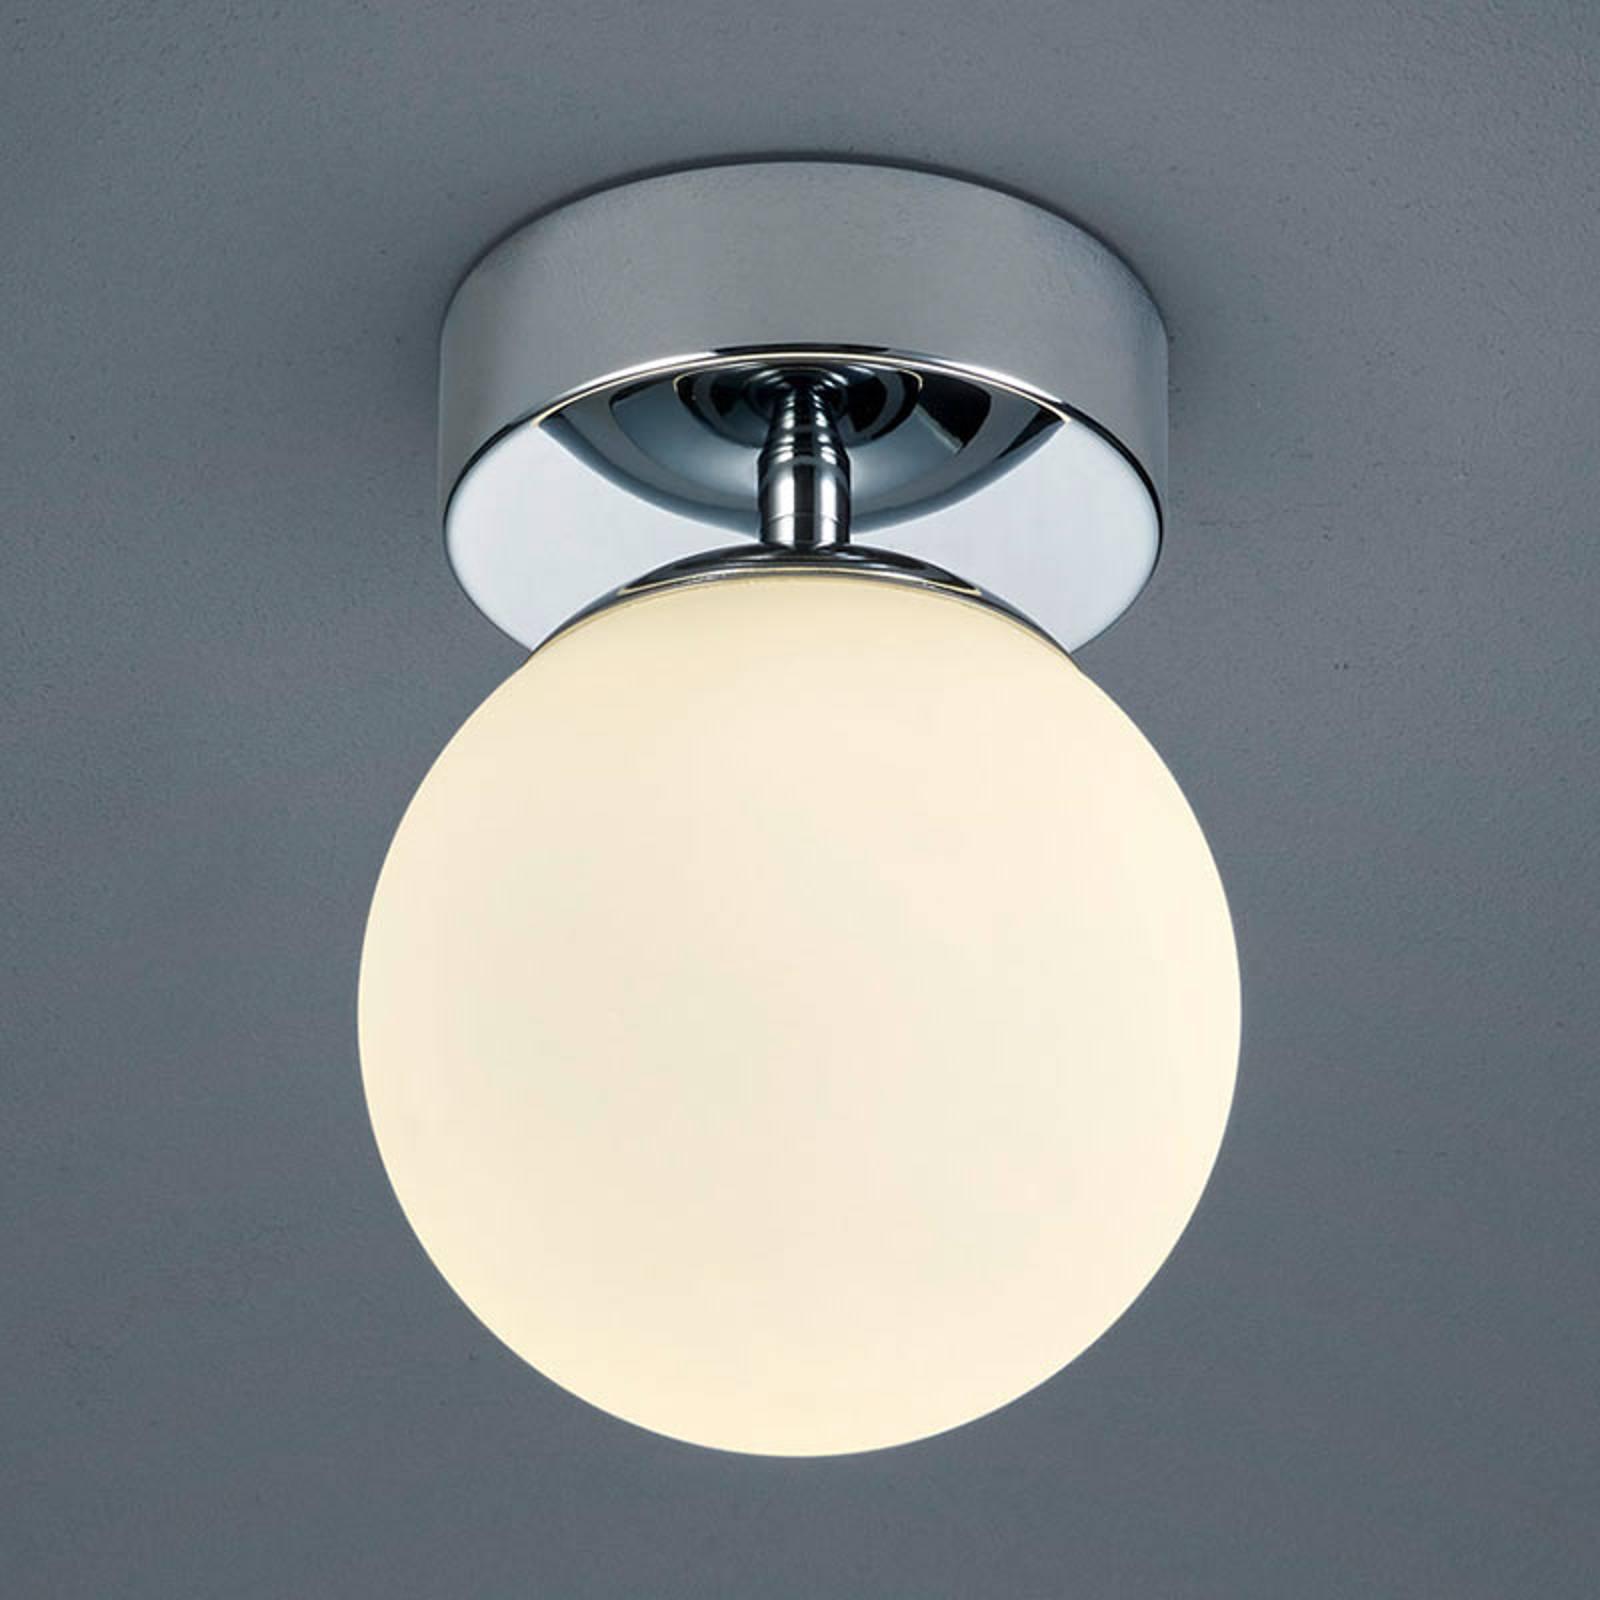 Helestra Keto - LED badkamer-plafondlamp, bol